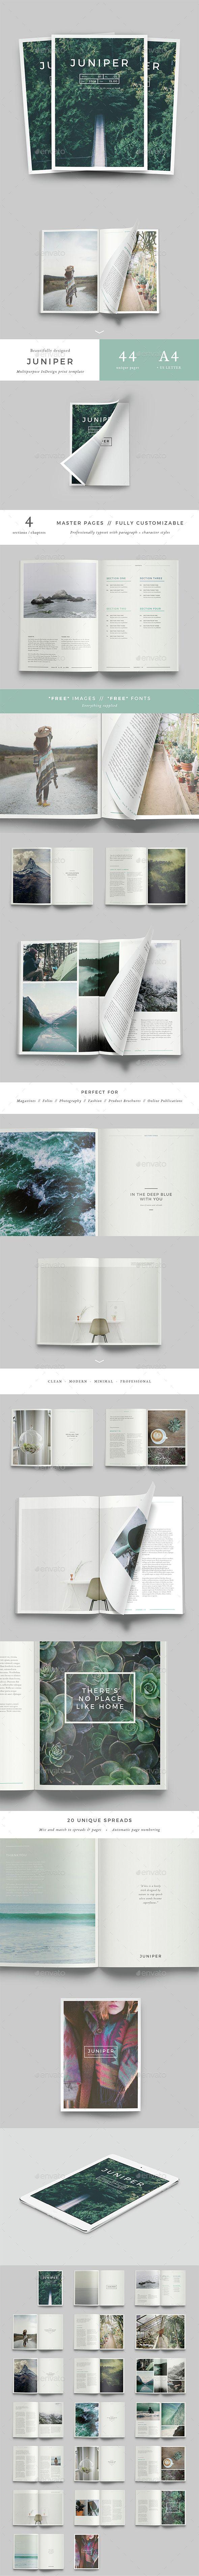 Juniper Magazine / Portfolio Template InDesign INDD. Download here: http://graphicriver.net/item/juniper-magazine-portfolio/14880769?ref=ksioks                                                                                                                                                     More